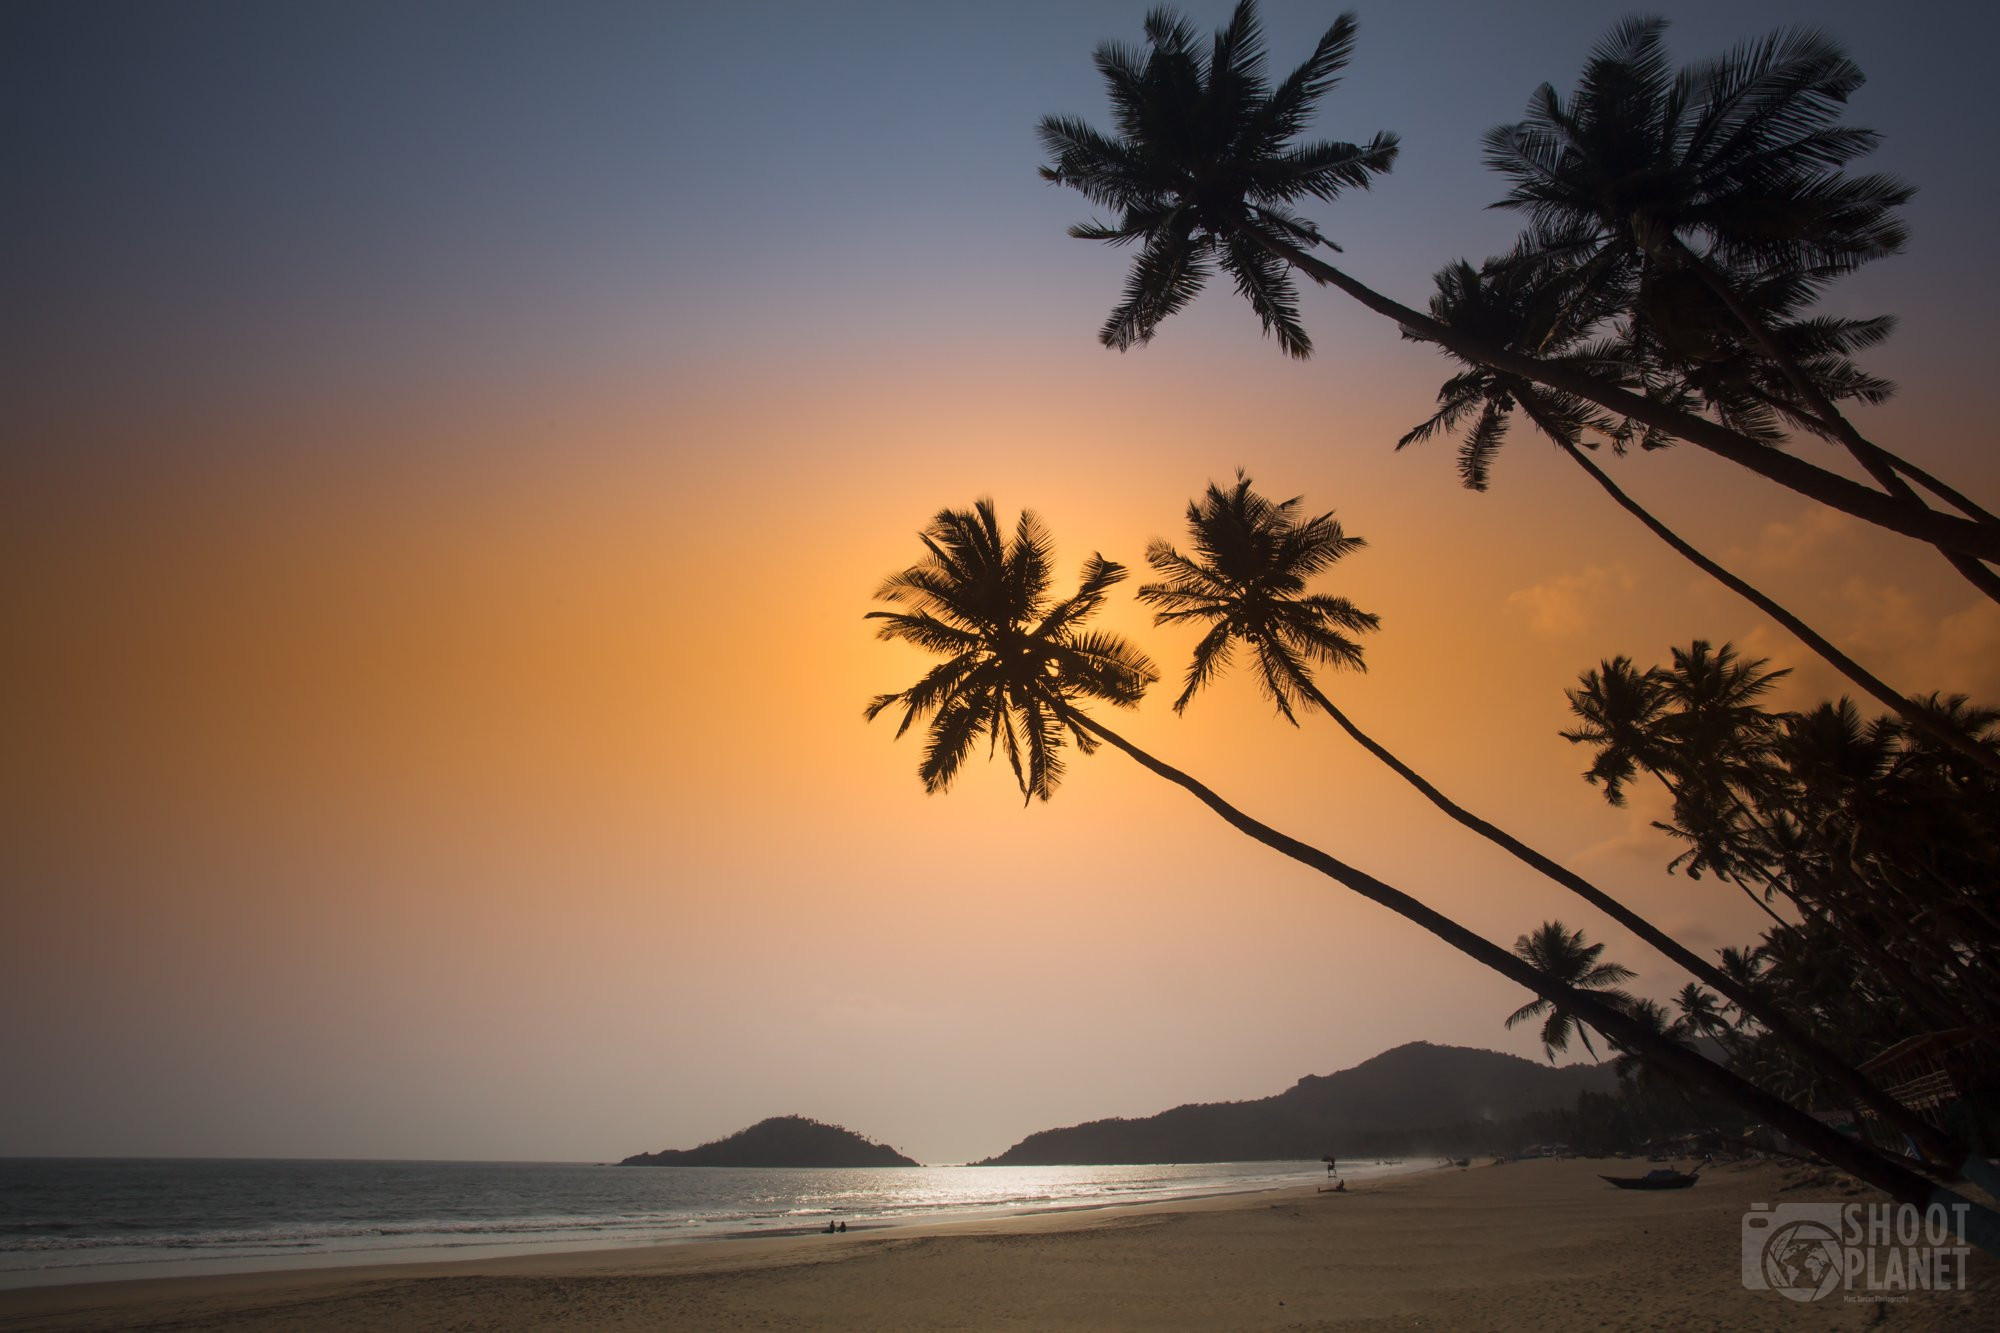 Palolem beach palm trees sunset , Goa India